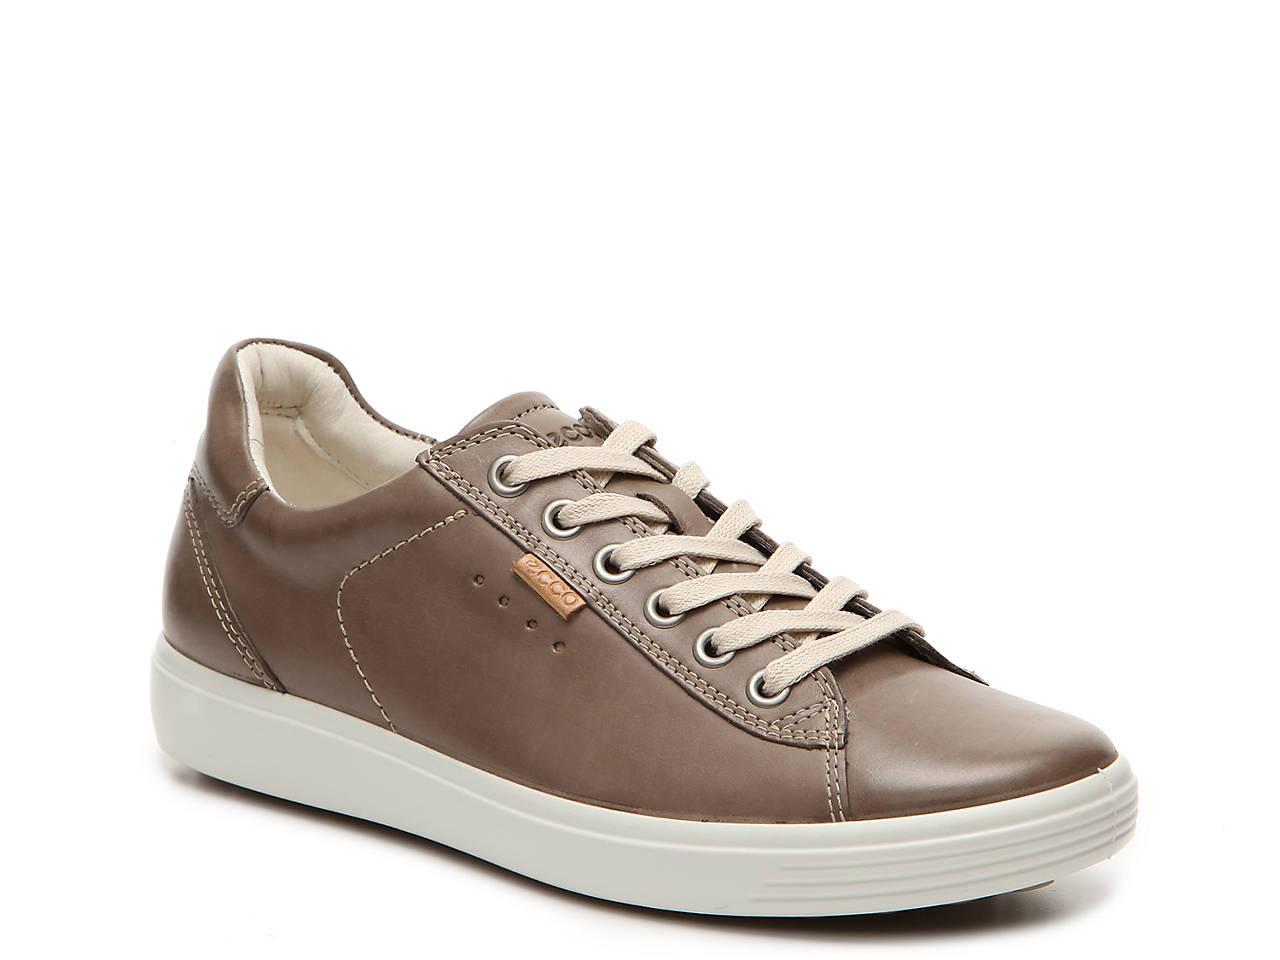 ECCO Shoes | LinkedIn